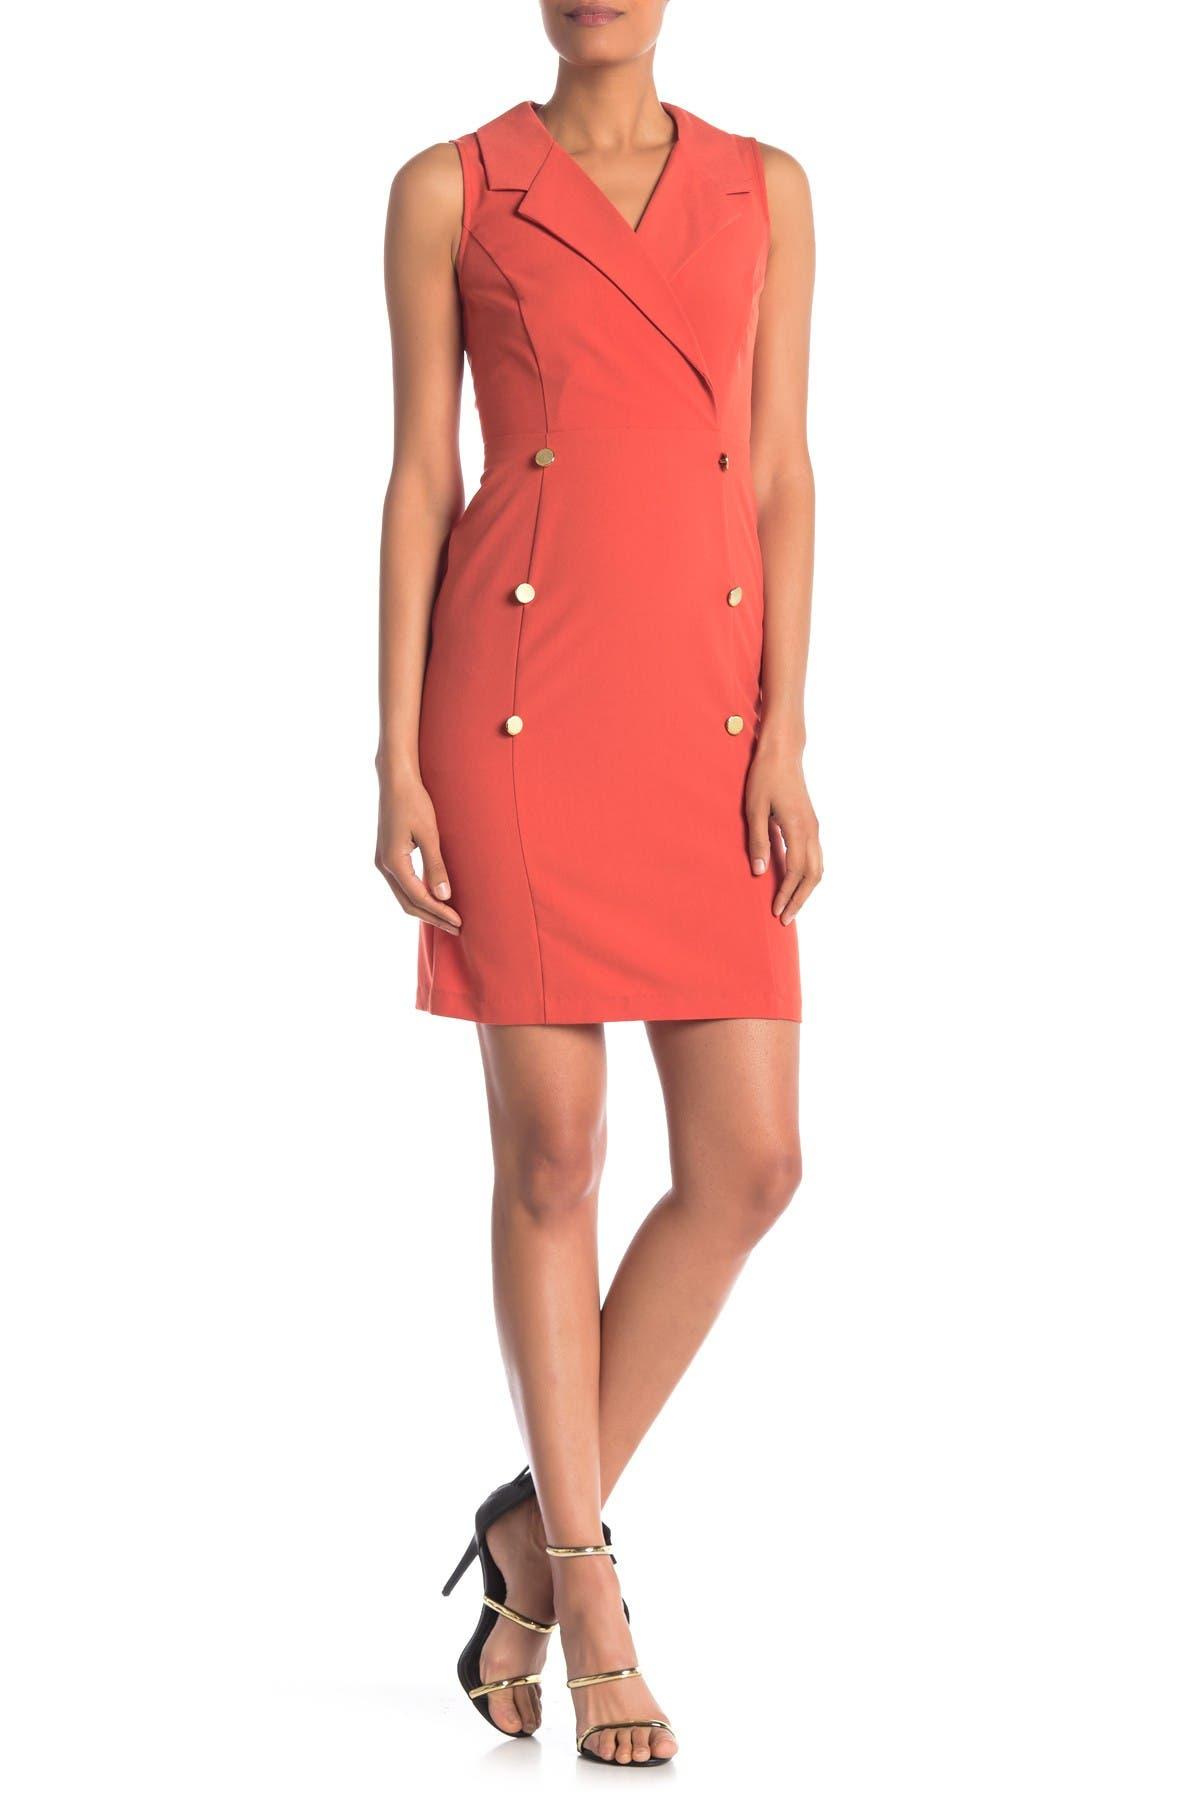 Image of Sharagano Sleeveless Trench Dress